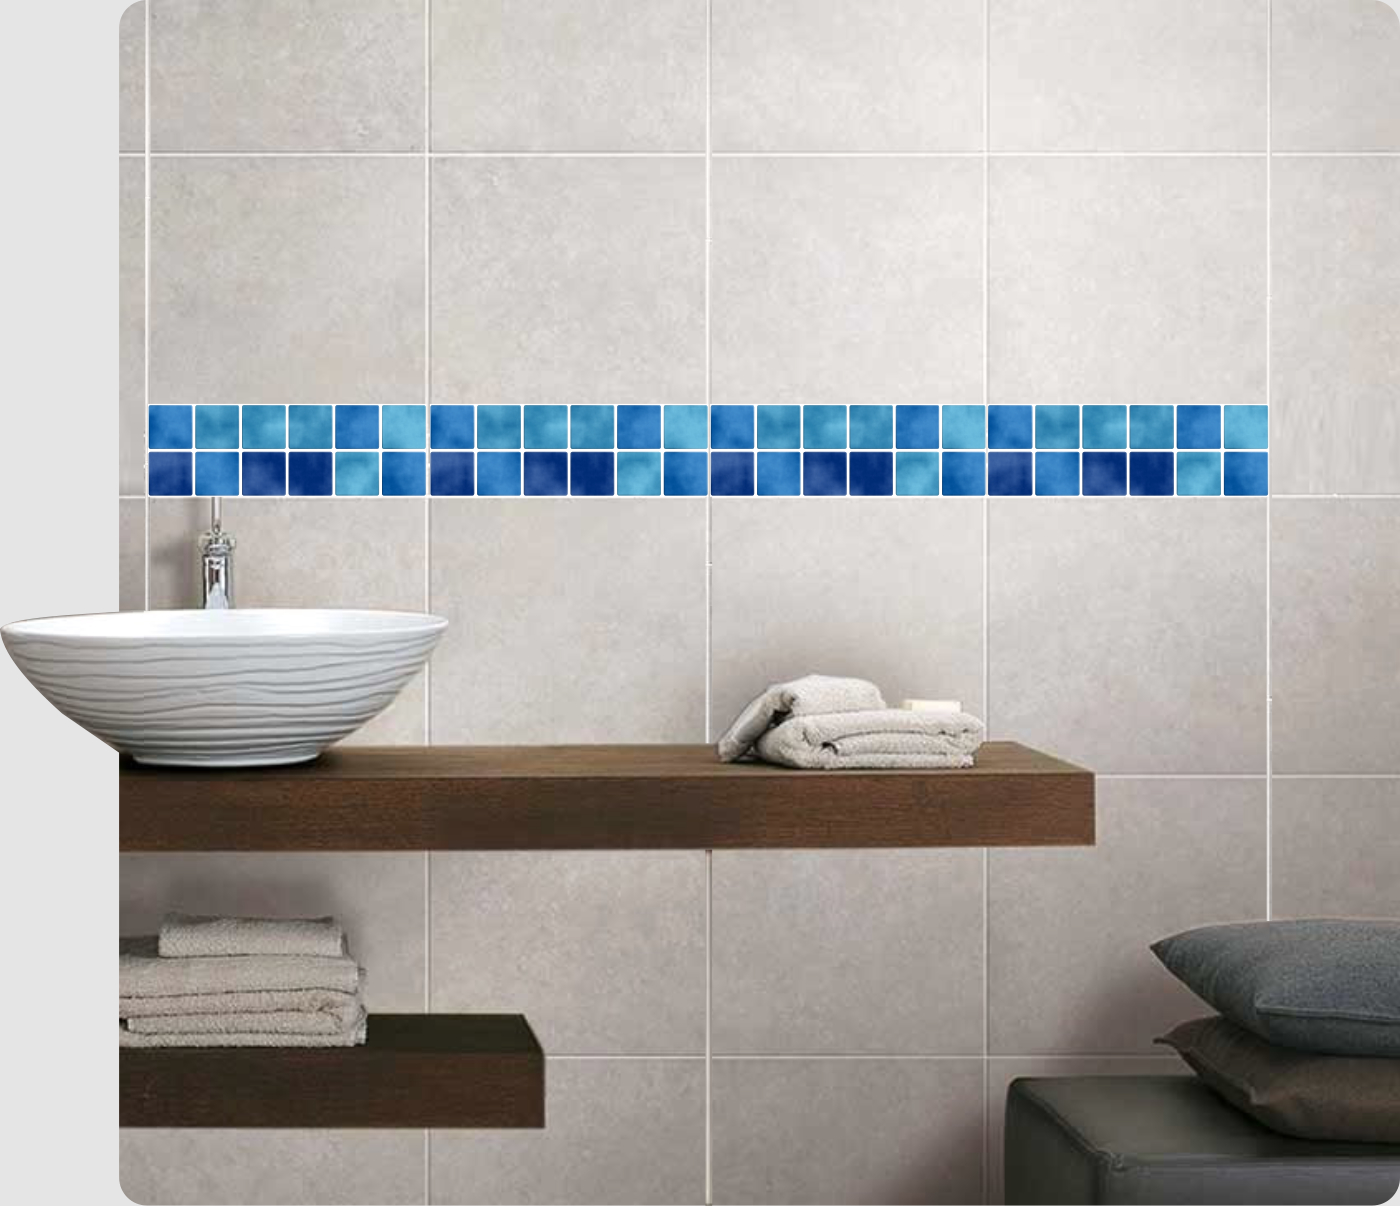 Details zu Mosaik Bordüre Blau Fliesenaufkleber Fliesenbild Fliesen Sticker  Fliesenimitat